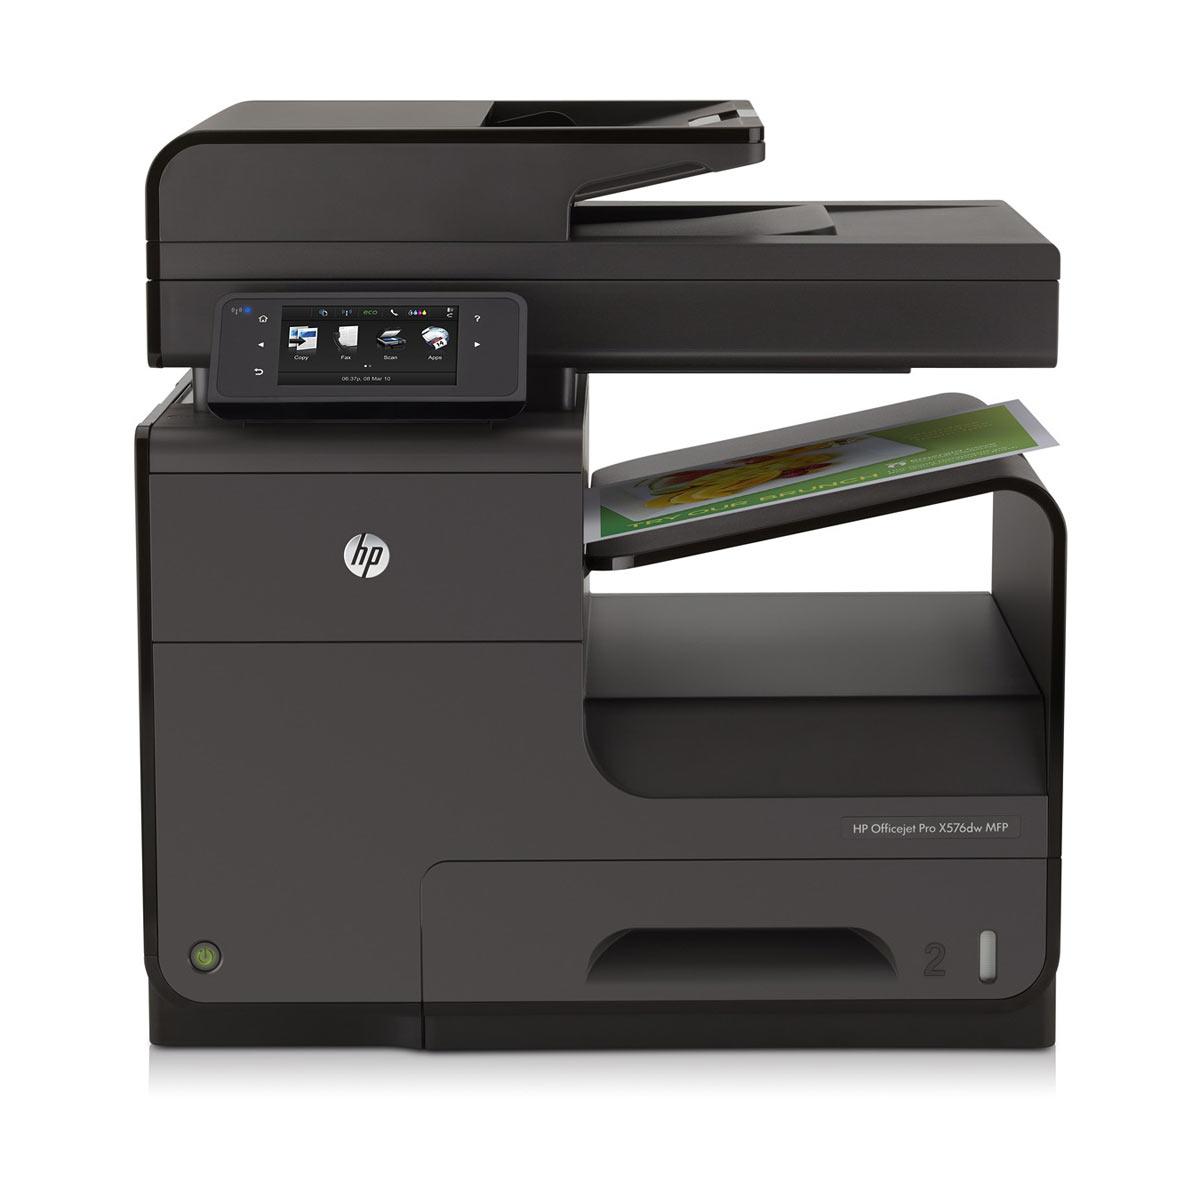 Imprimante multifonction HP Officejet Pro X576dw Imprimante Multifonction jet d'encre couleur 4-en-1 (USB 2.0 / Ethernet / Wi-Fi)